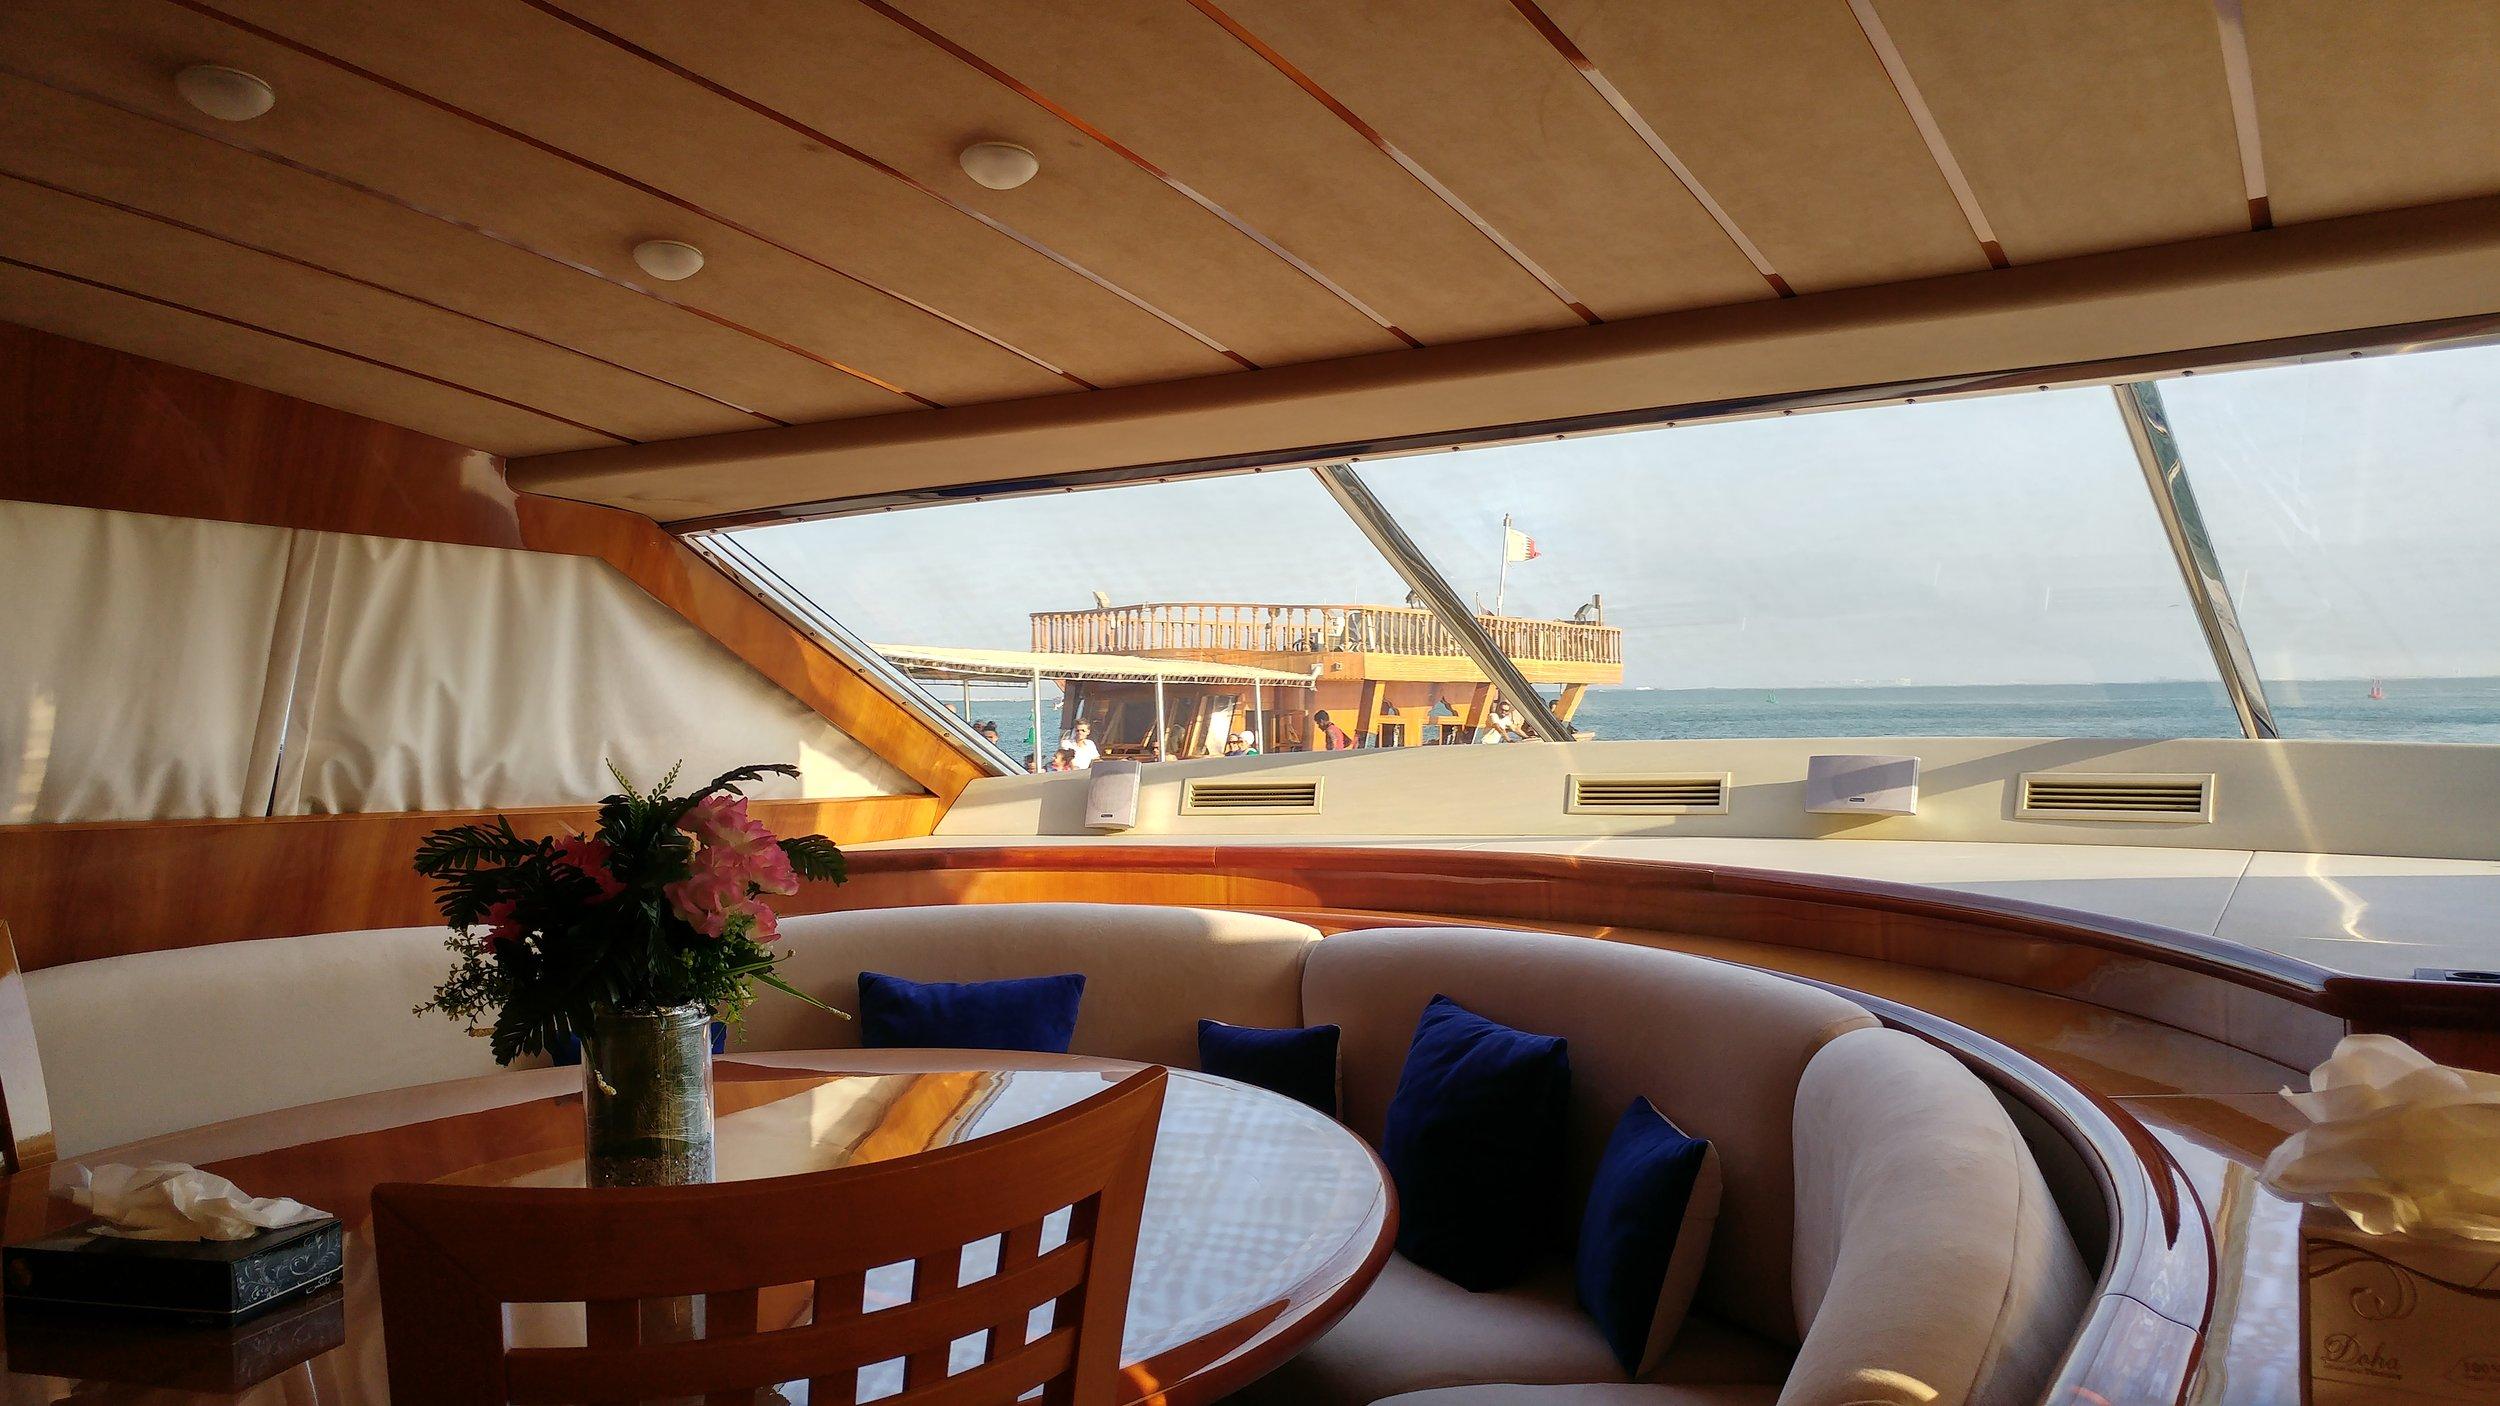 qatar-blogger-luxury-yacht-arabian-sea-creativitywithkay-khansa-lounge-area.jpg